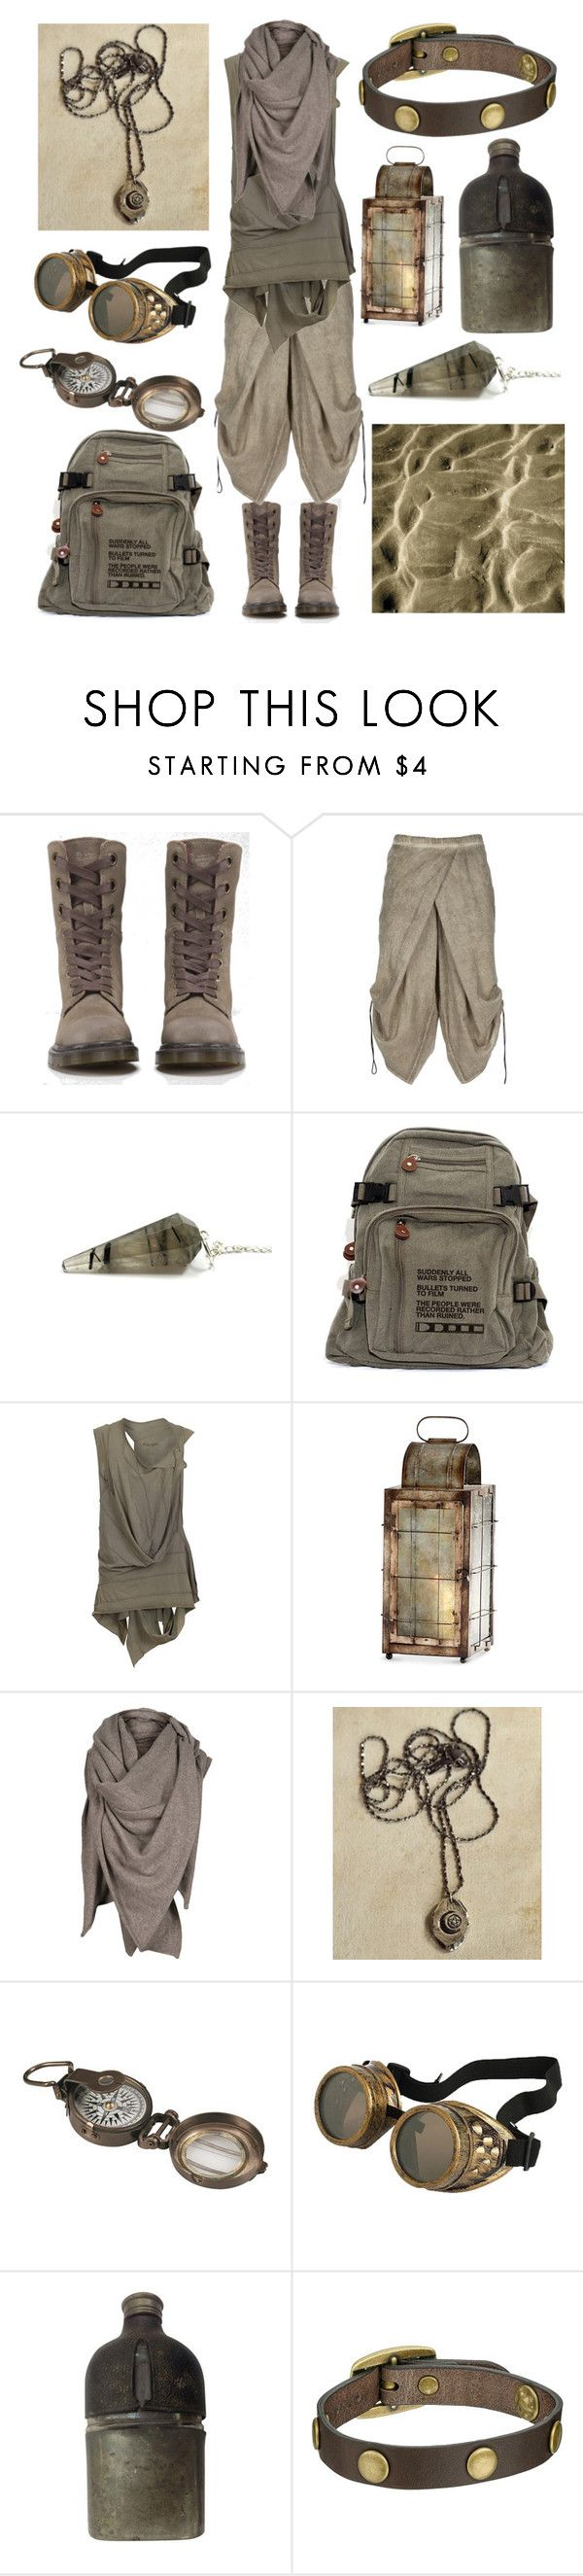 Desert Nomad by maggiehemlock on Polyvore featuring AllSaints, Lumen et Umbra, Dr. Martens, Frye, Cyan Design and Dot & Bo